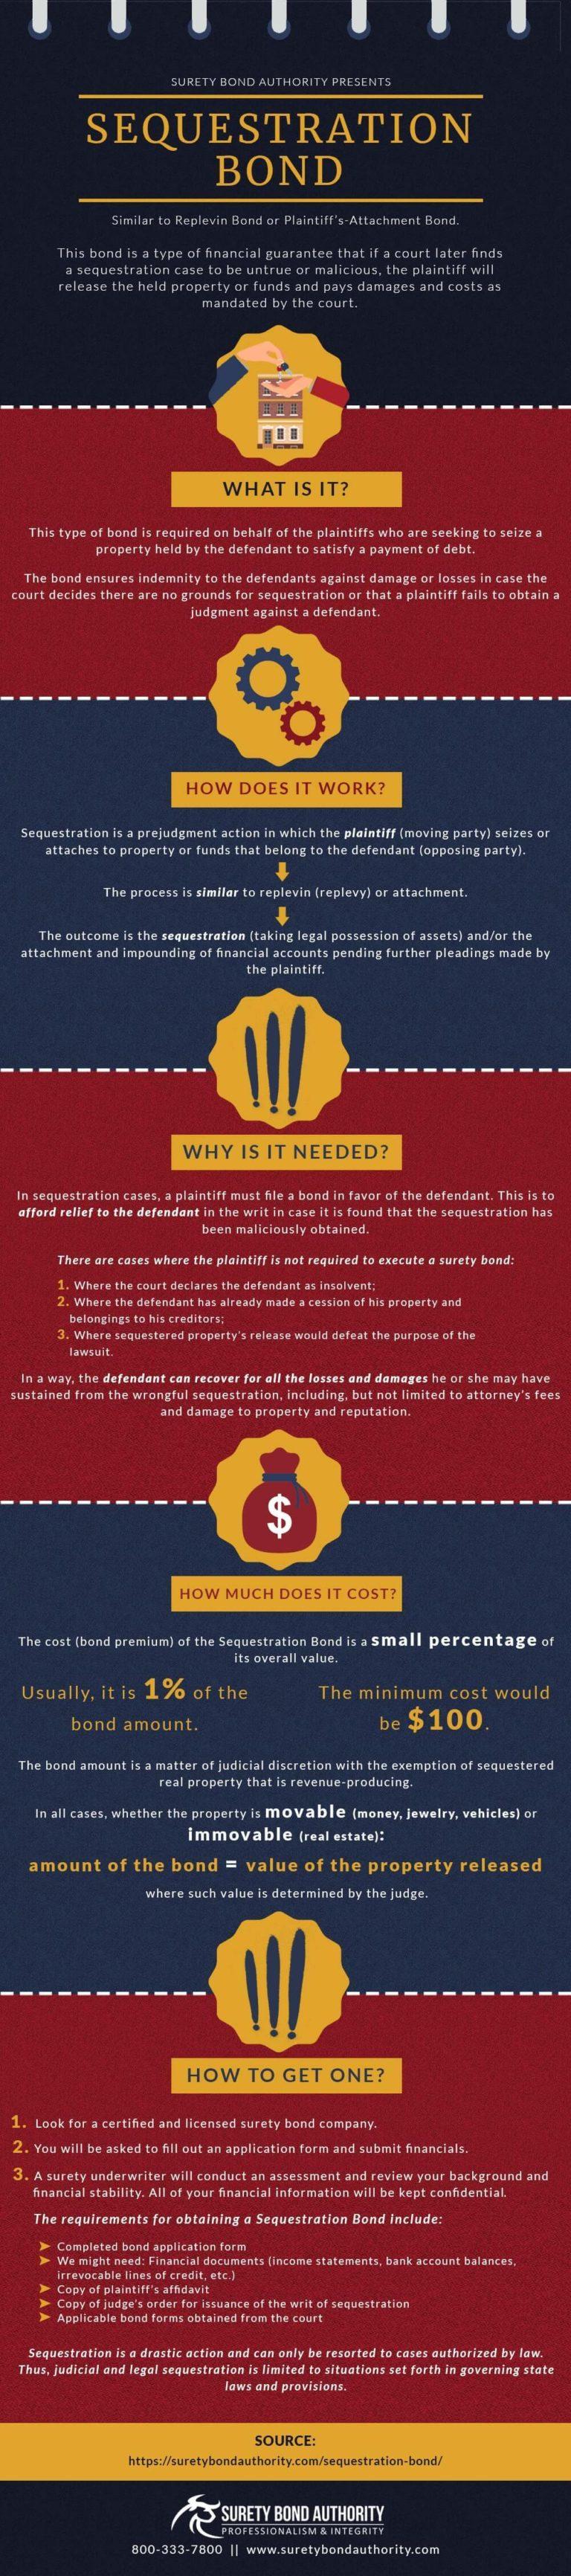 Sequestration Bond Infographic